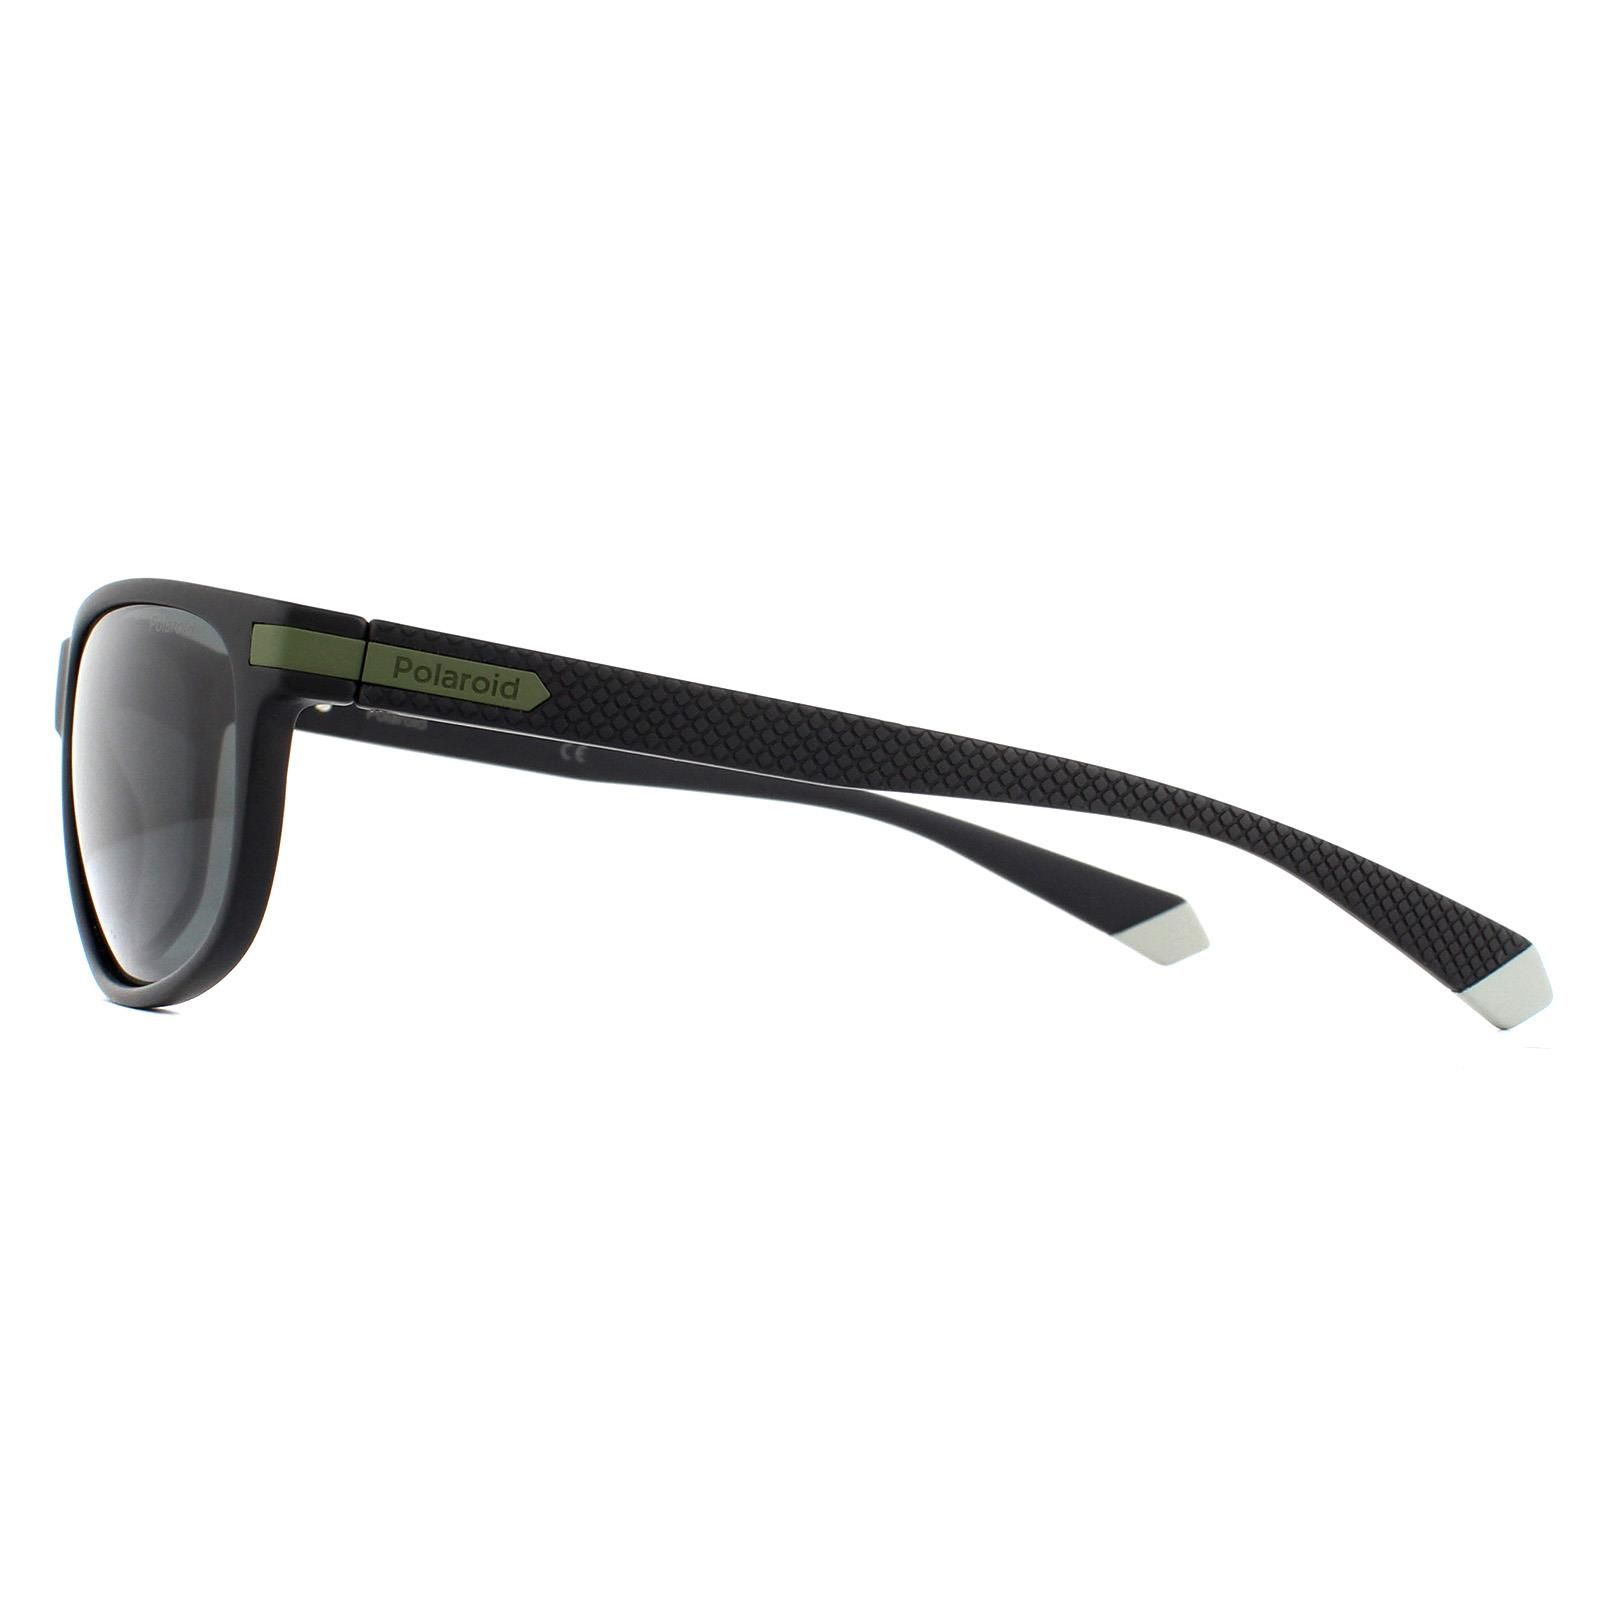 Polaroid Sunglasses PLD 2099/S 7ZJ M9 Black Green Grey Polarized